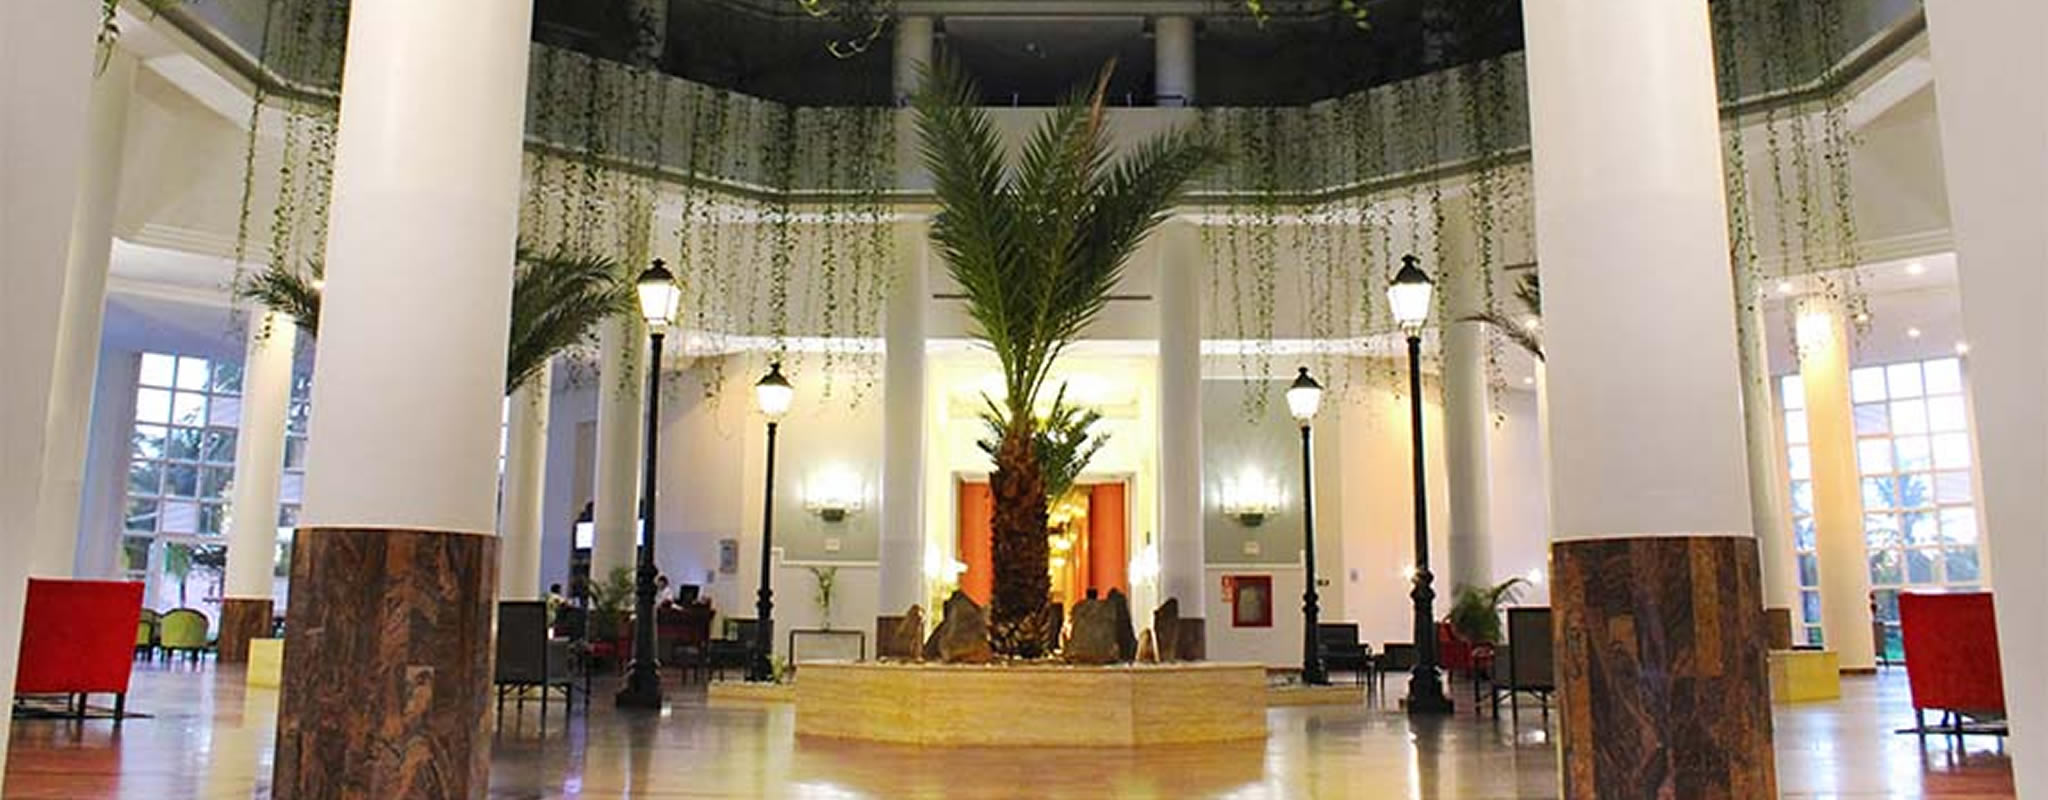 Lobby Hesperia Isla Margarita